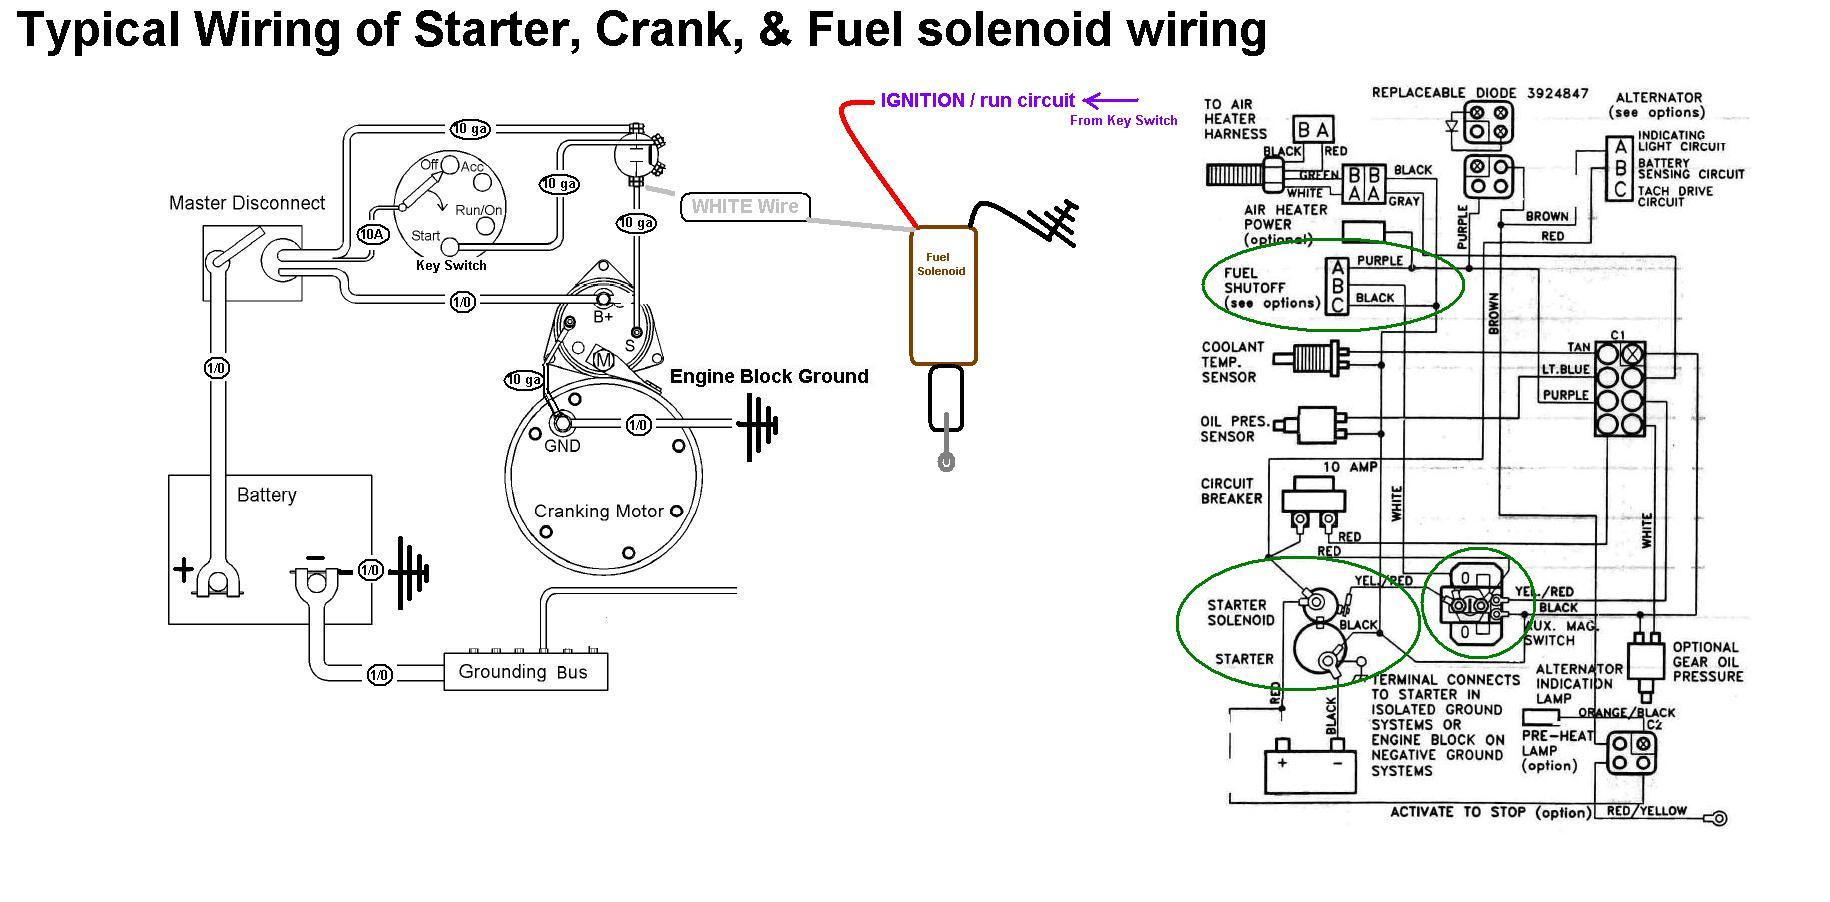 yanmar ignition wiring diagram yanmar 2002d wiring diagram lights wiring diagram  yanmar 2002d wiring diagram lights